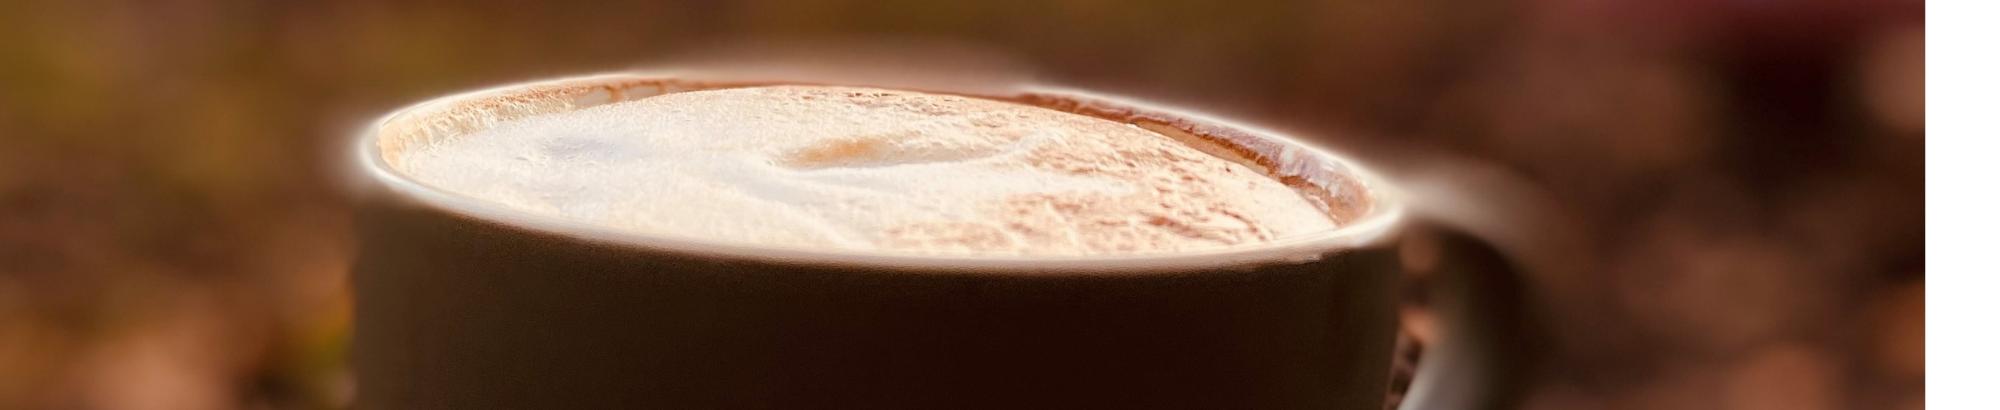 coffee photo website